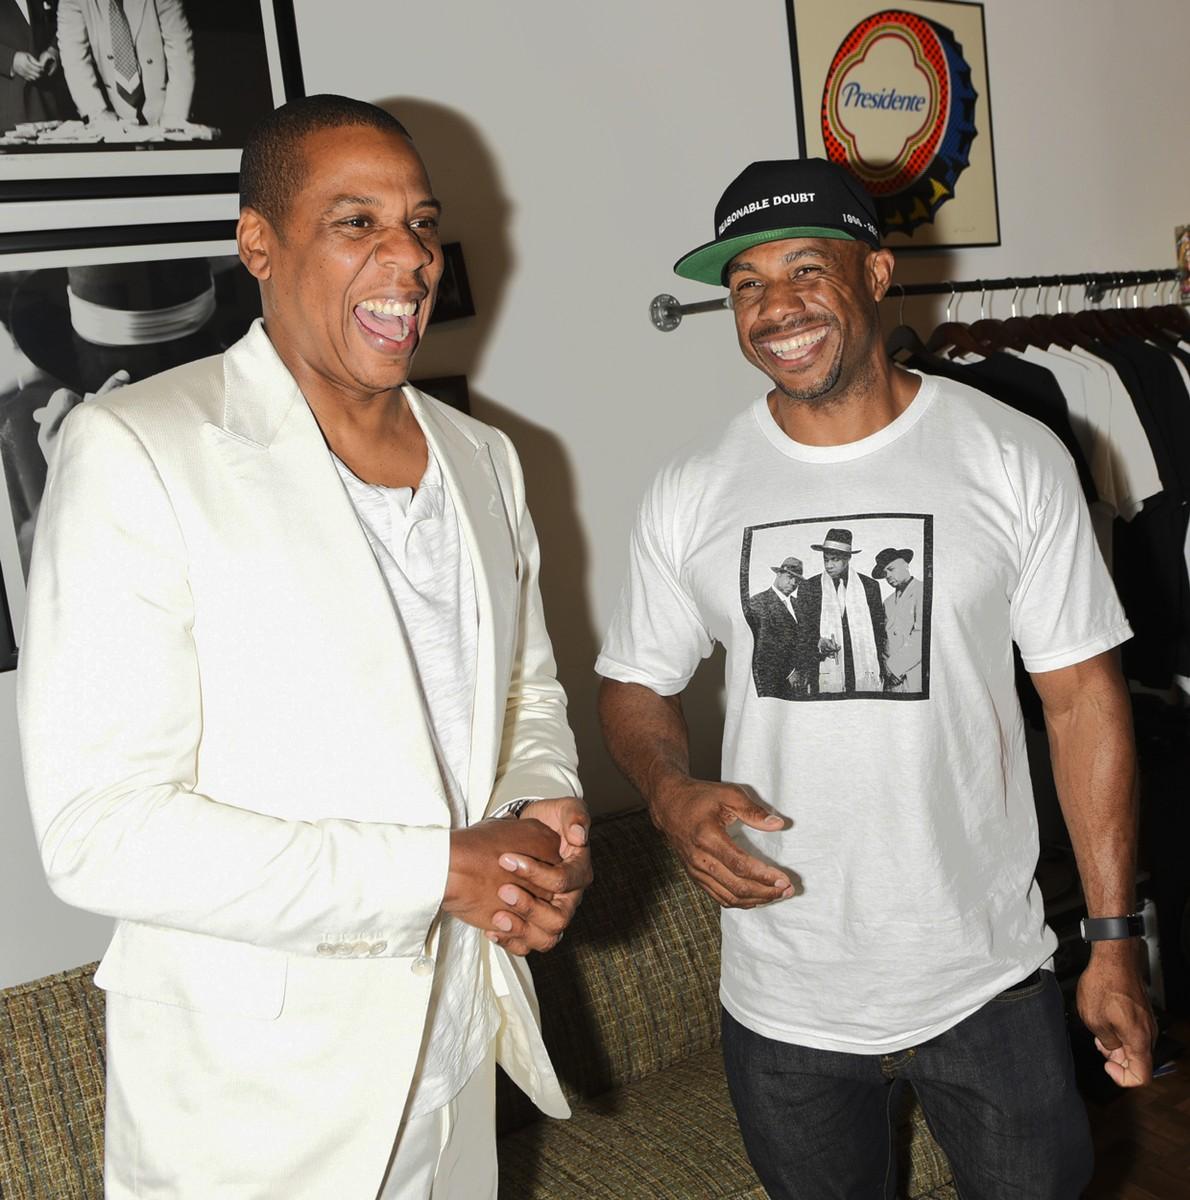 Jay-Z and Kareem 'Biggs' Burke